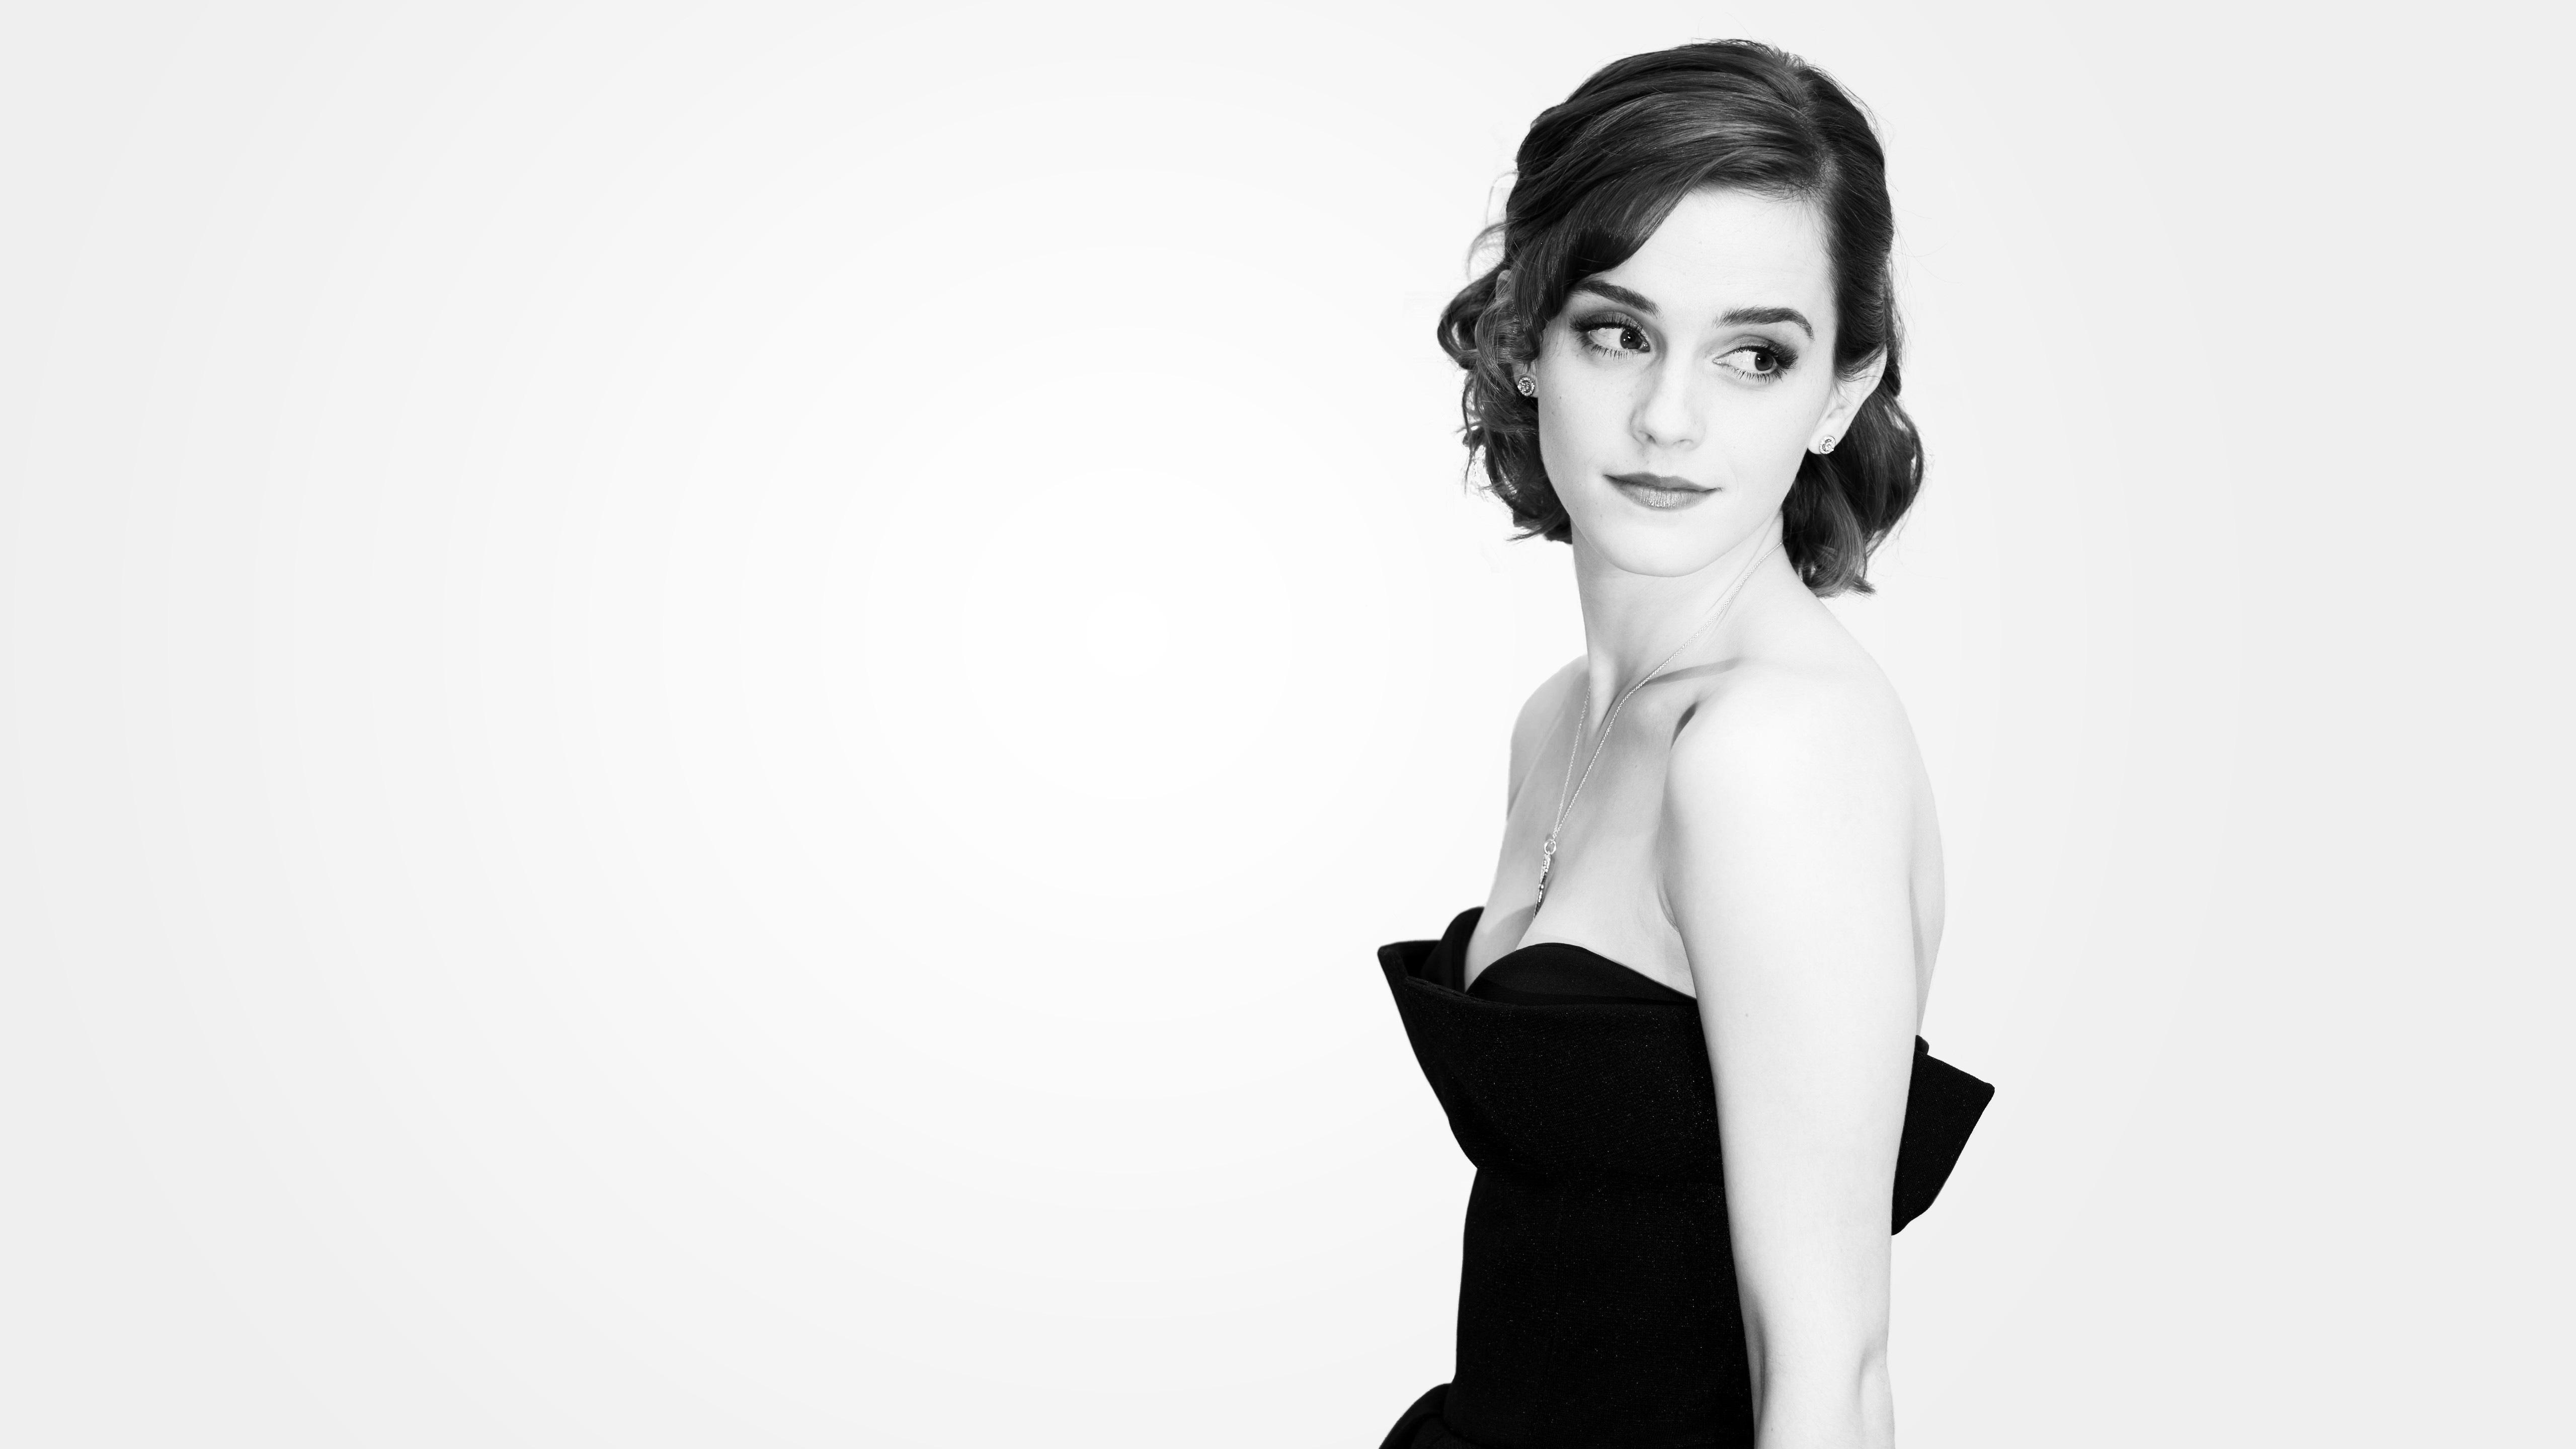 Emma Watson, Эмма Уотсон, Гермиона обои скачать